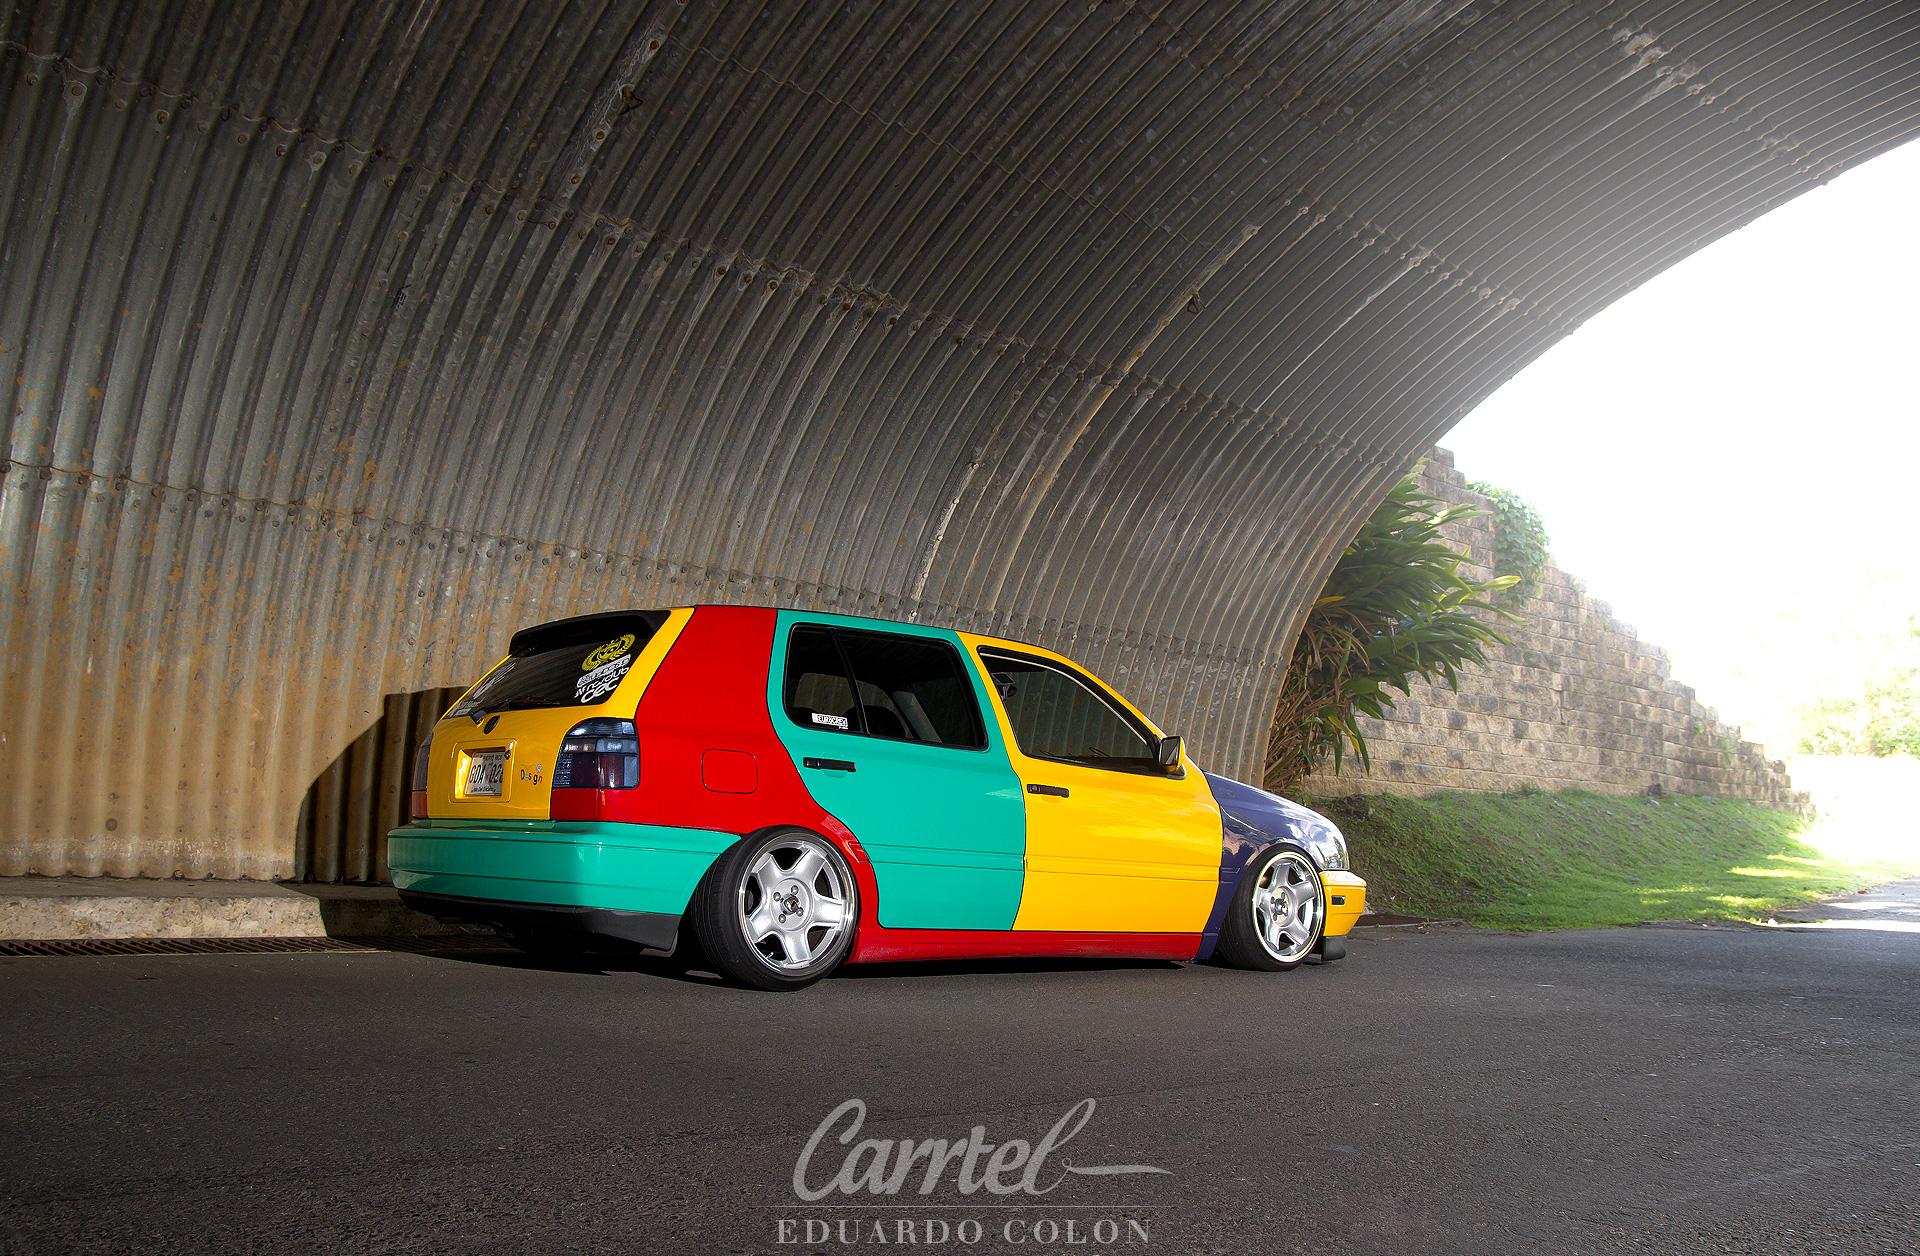 ◄-The Dub Club - A VW Enthusiast Club-► [NEW PUZZLE IN OP] 12174051033_4264193bbc_o